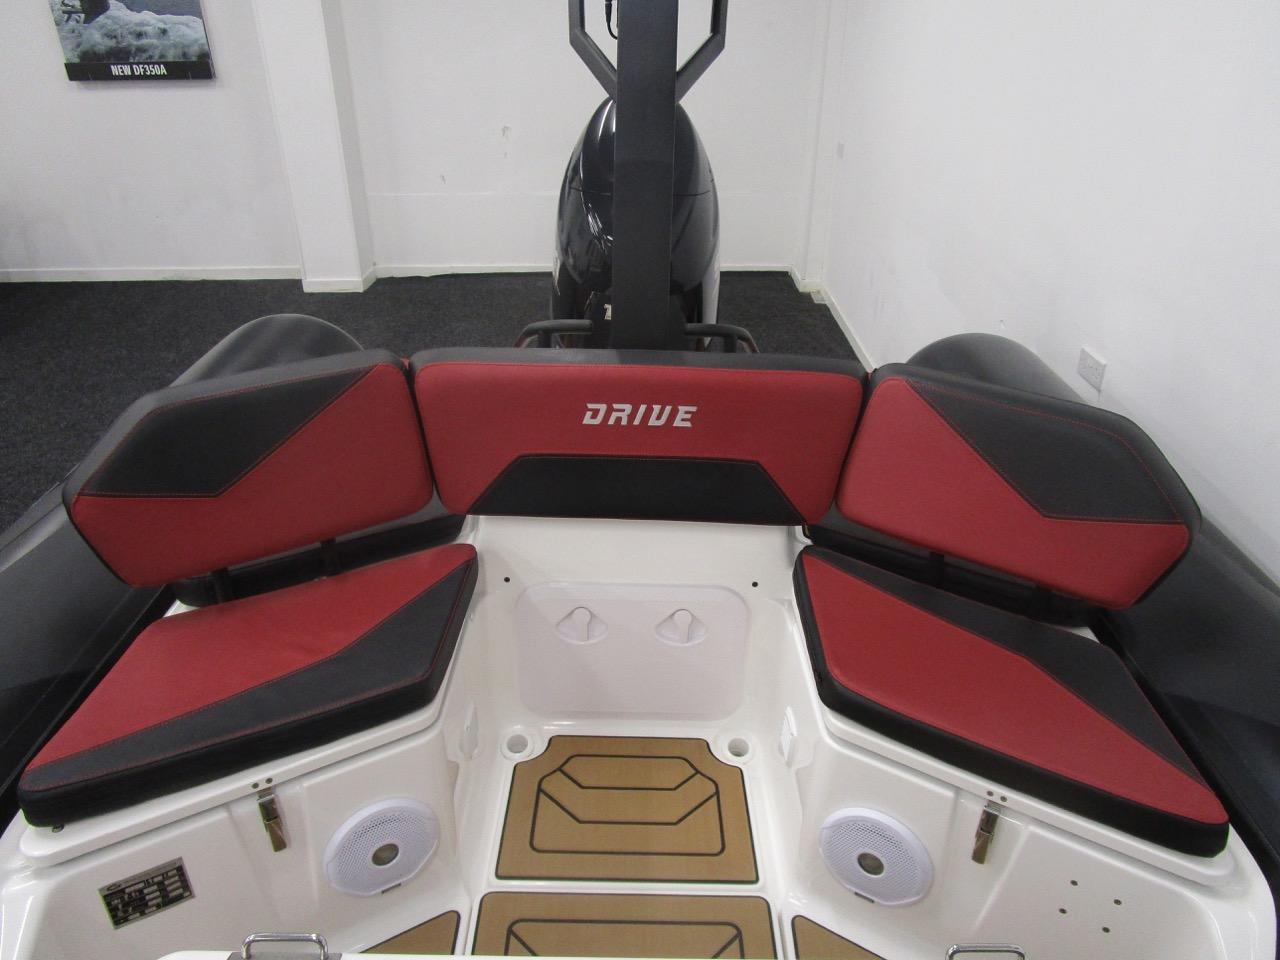 GRAND DRIVE D600 RIB rear seat no infill